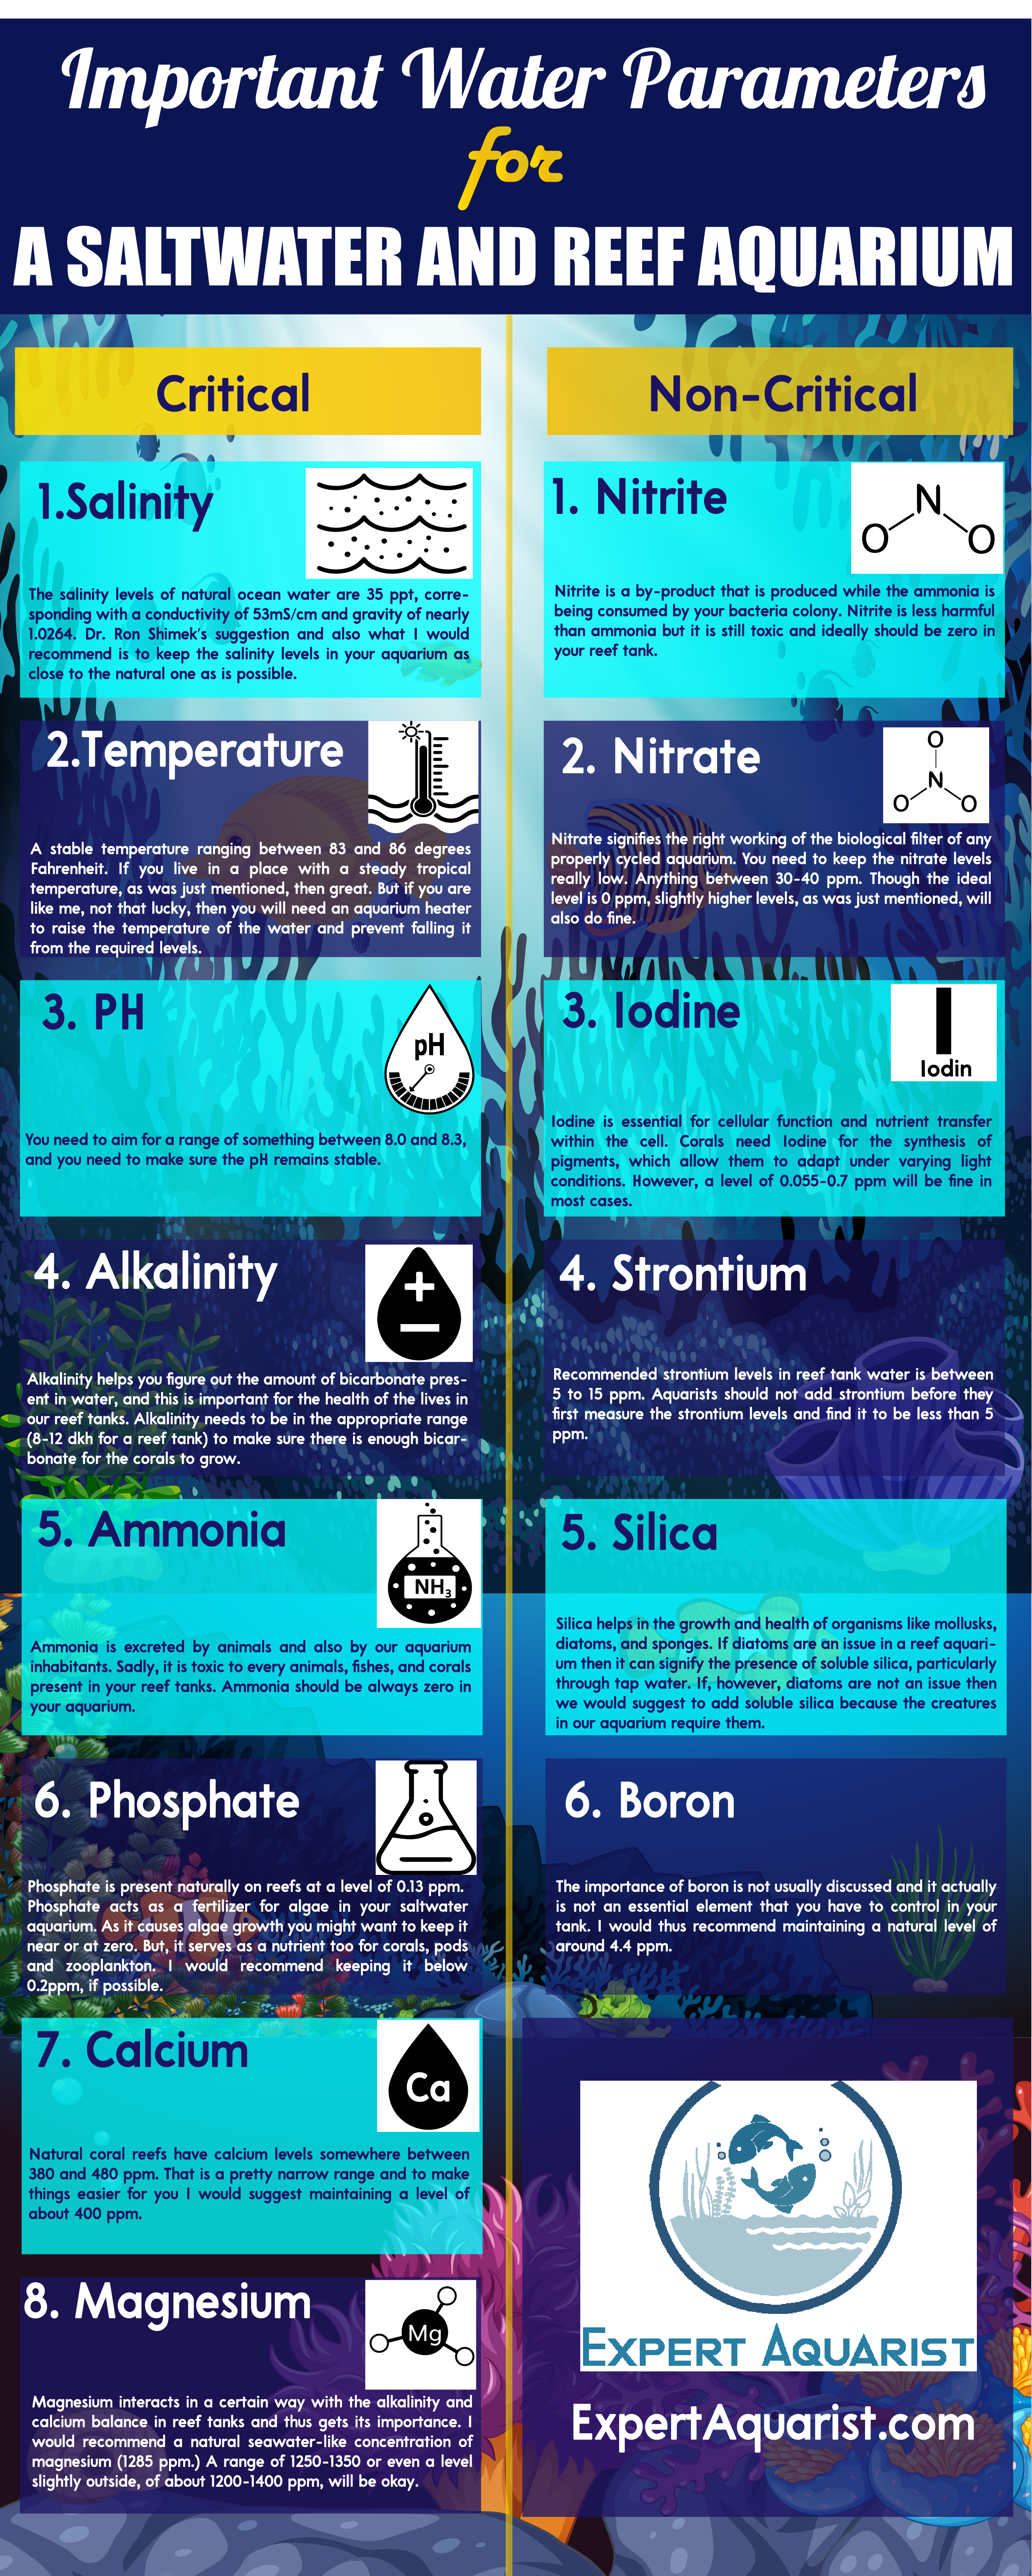 Most Important Water Parameters For A Saltwater Reef Tank In 2020 Reef Tank Aquascaping Reef Tank Reef Aquarium